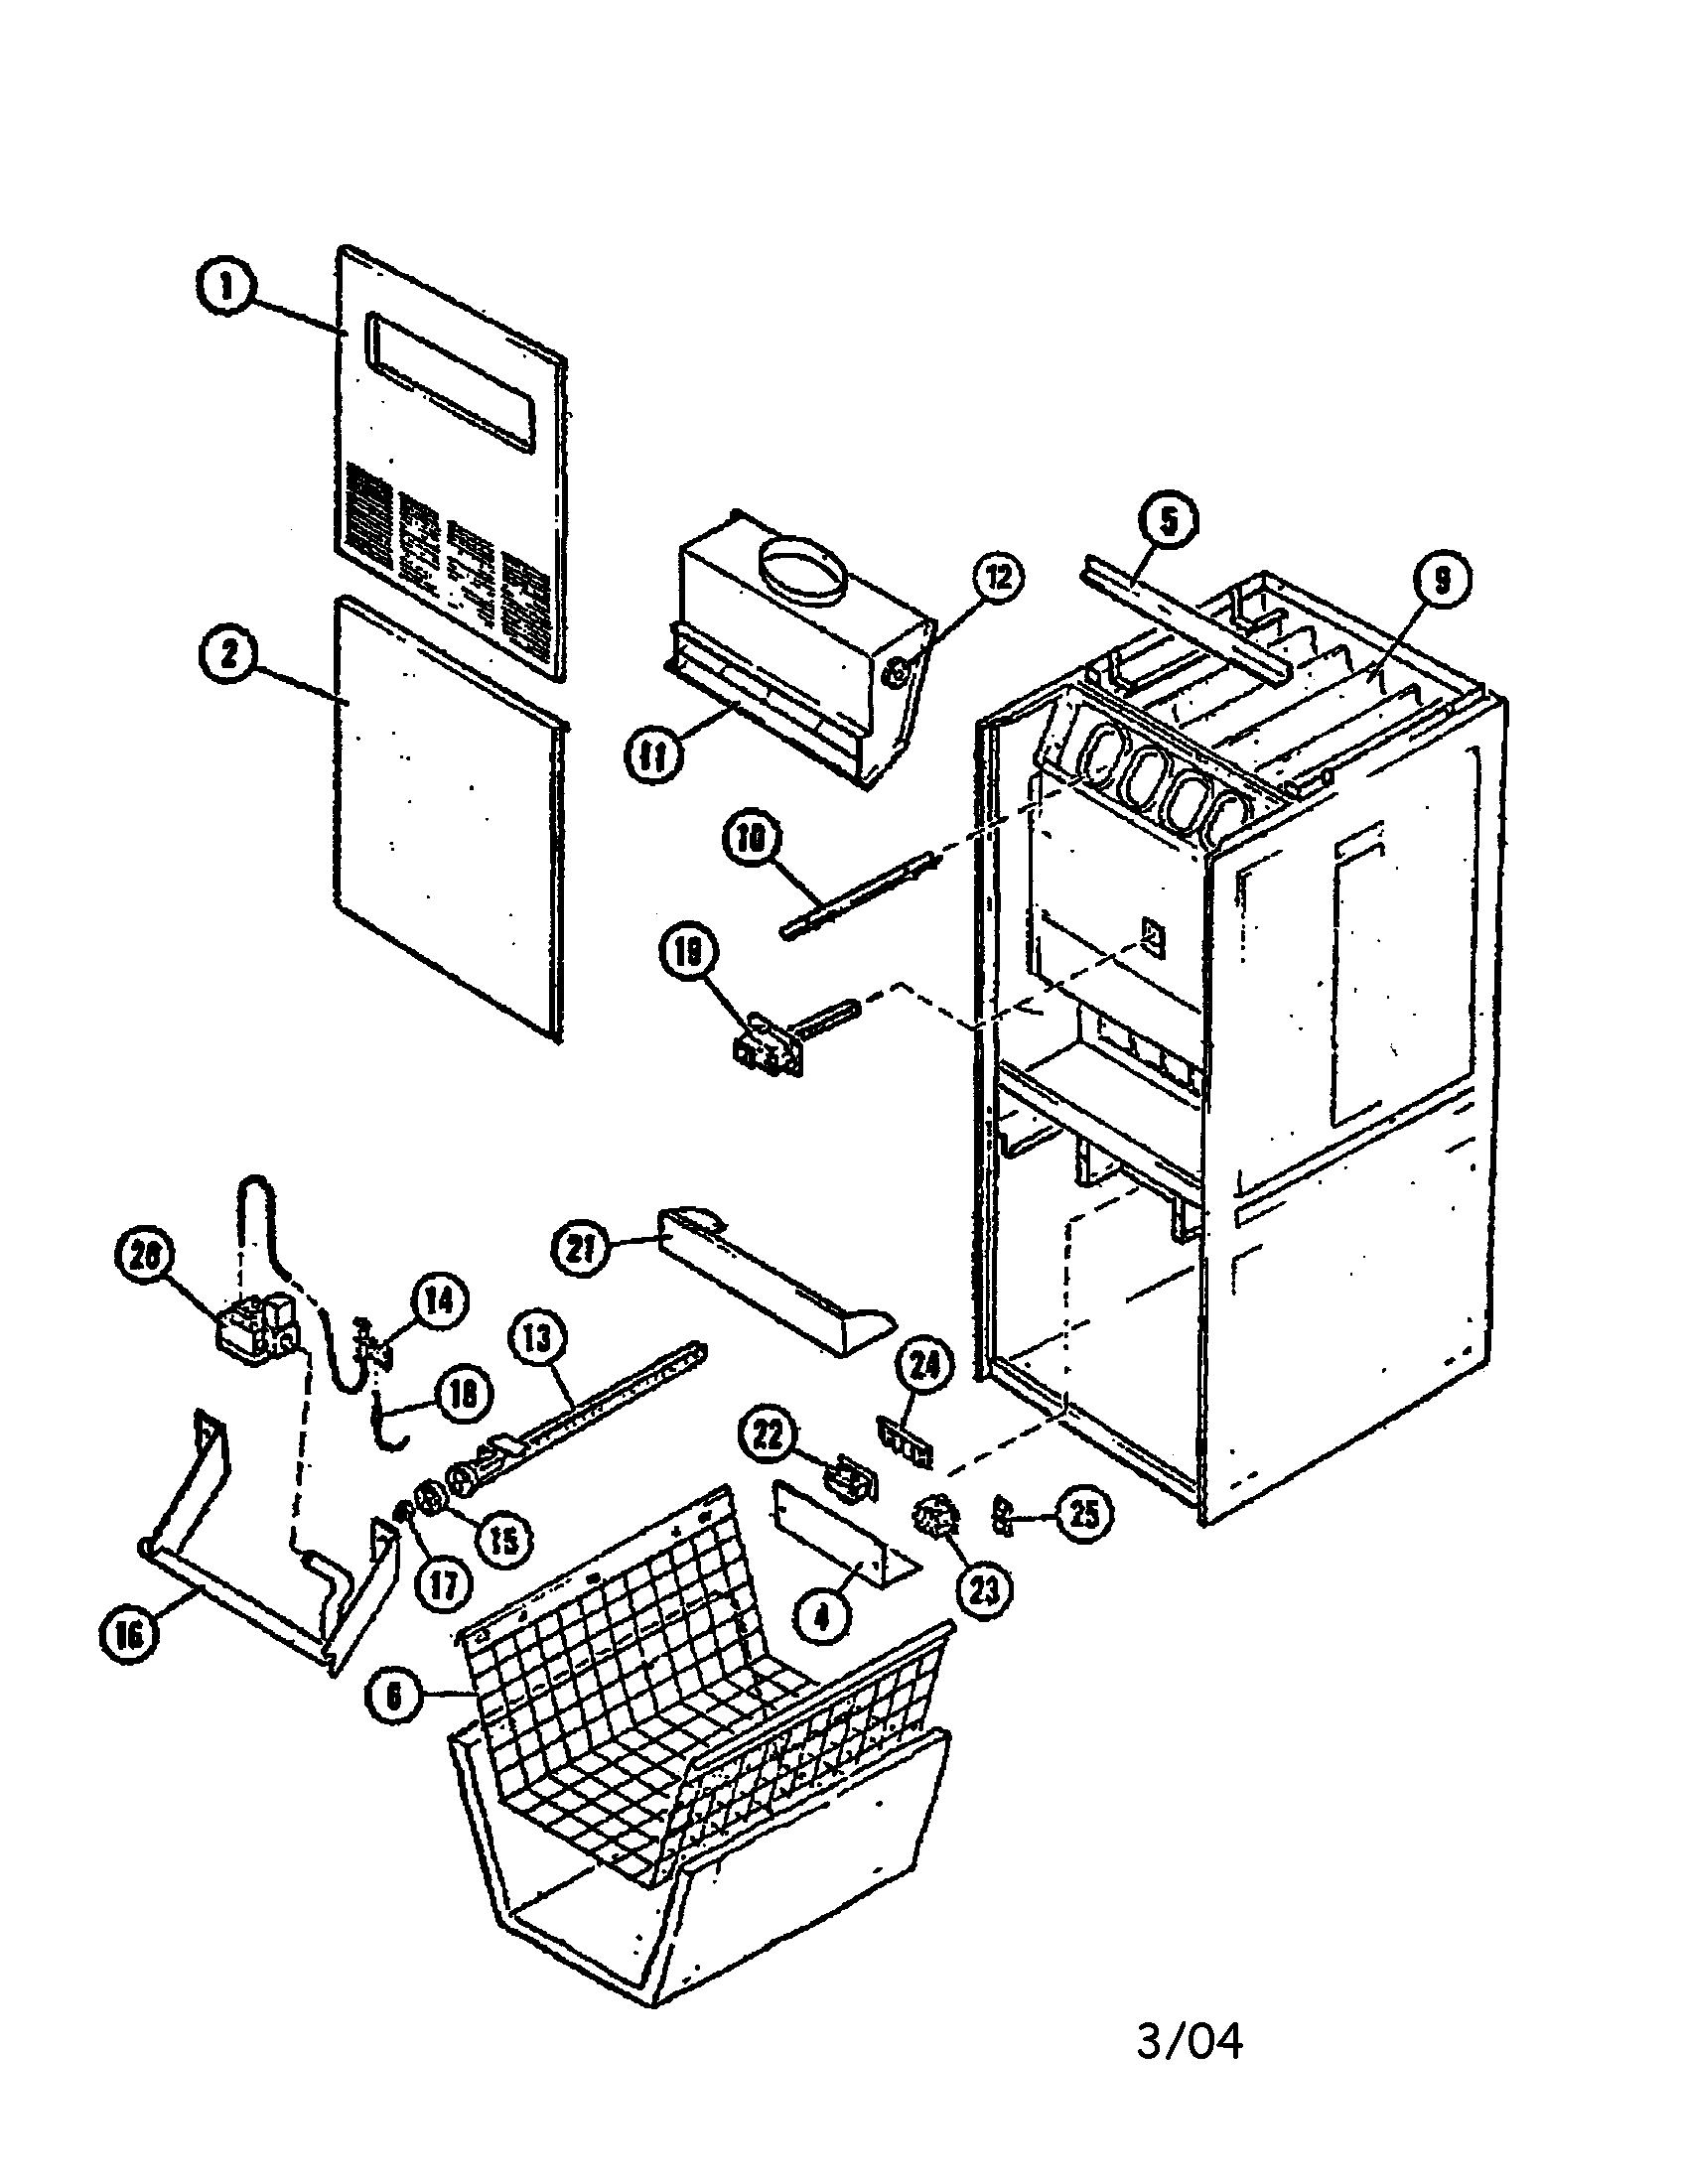 payne furnace wiring diagram warn m8000 remote lennox hvac – the readingrat.net